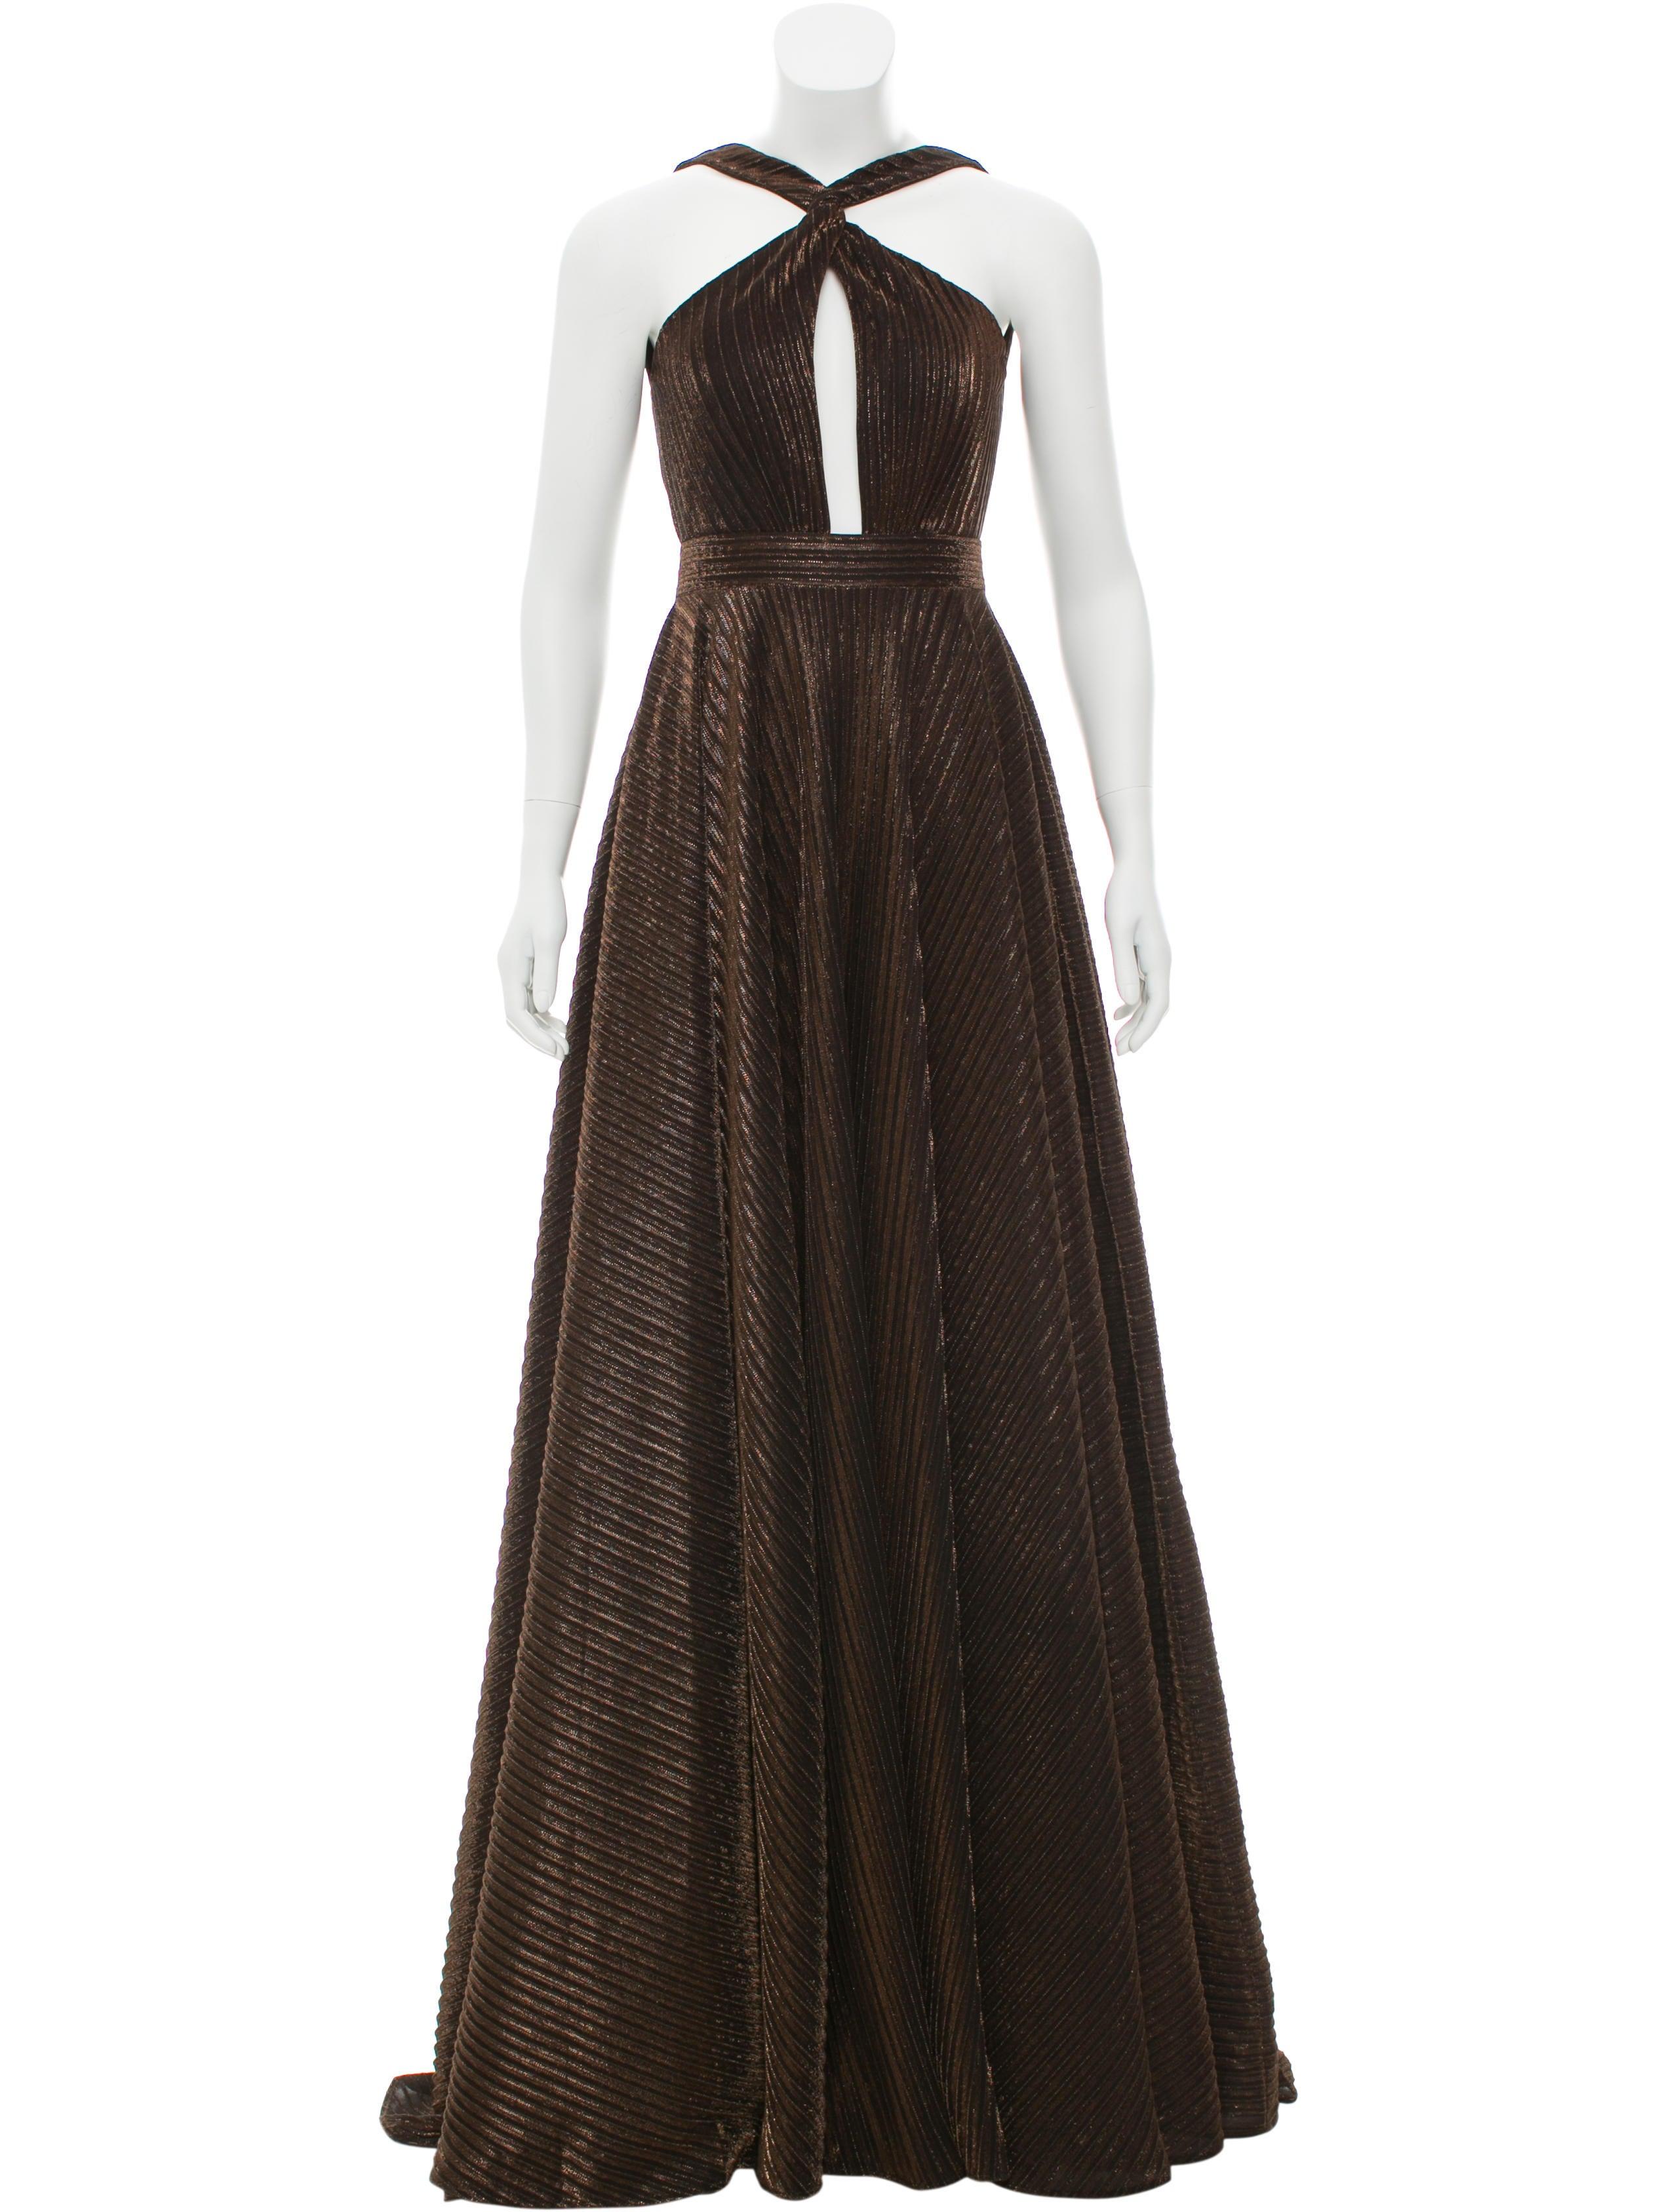 Jovani Metallic Evening Gown - Clothing - WJOVI20452 | The RealReal